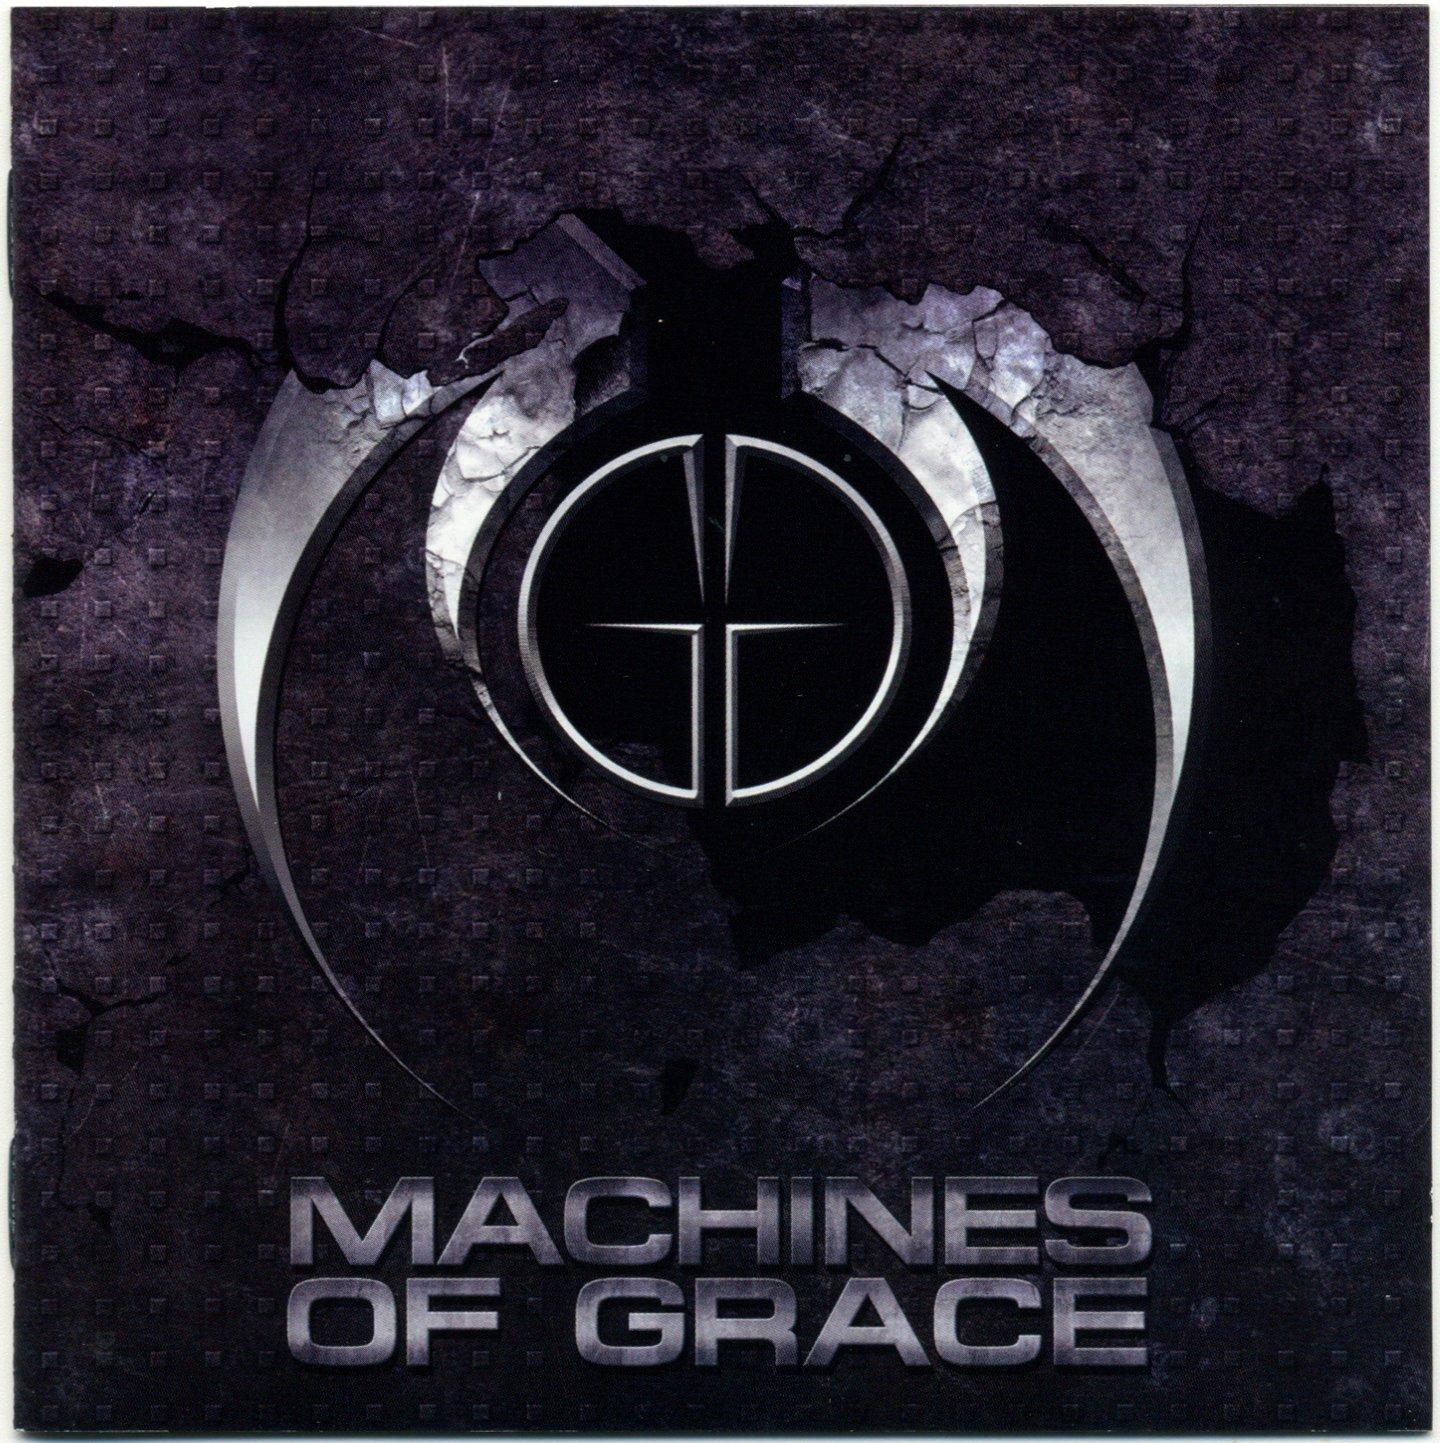 Machines of Grace Self-Titled S/T CD Savatage